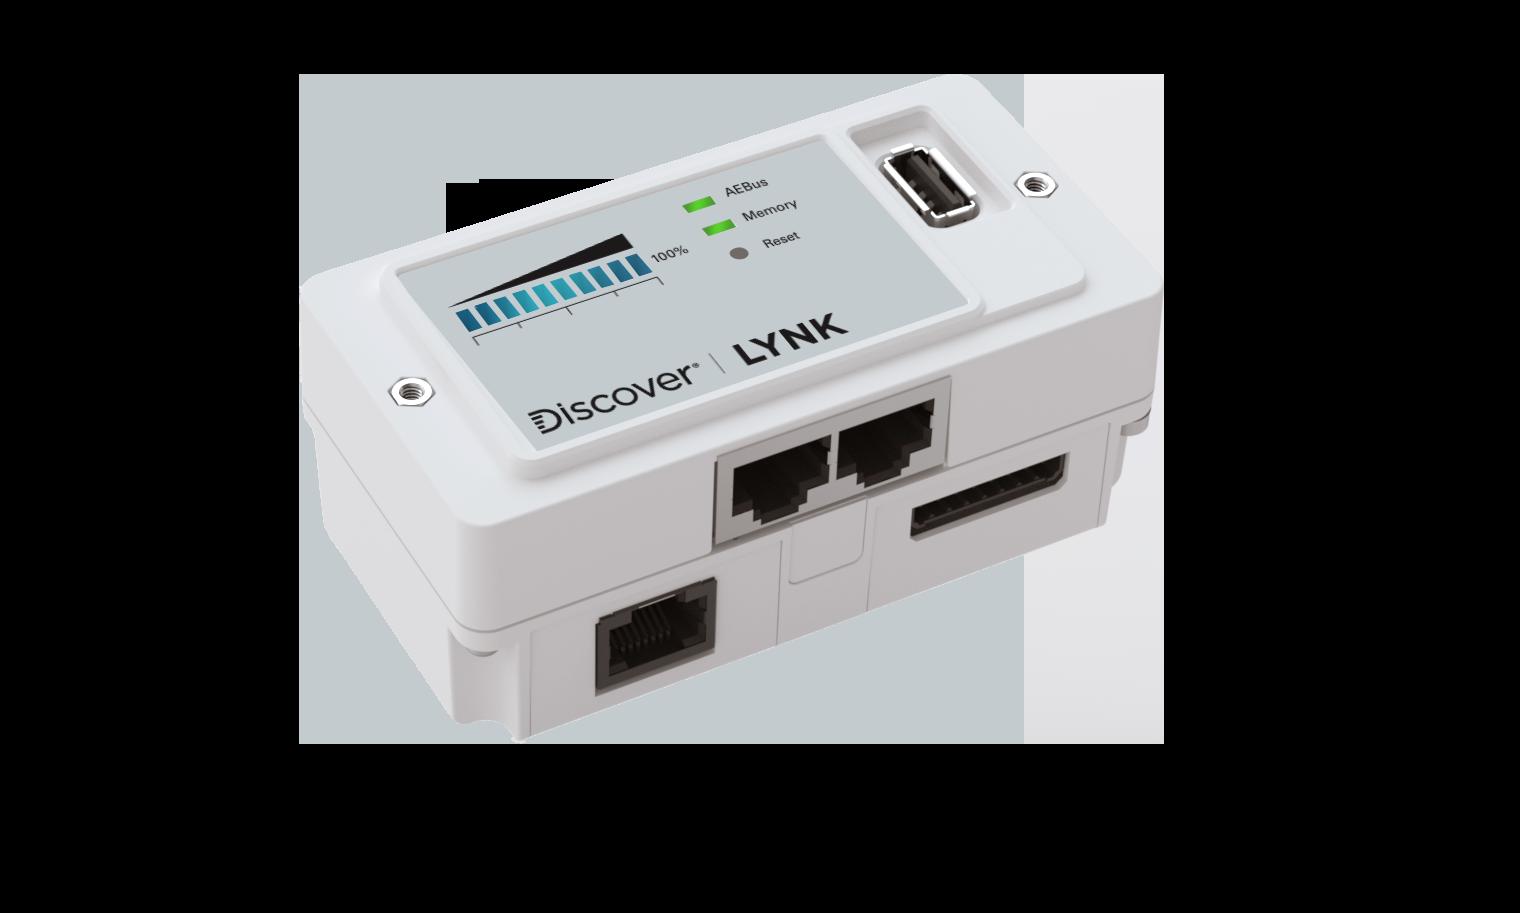 03-870-0051-img-aes-lynk-communication-gateway-rotated-port-20190423